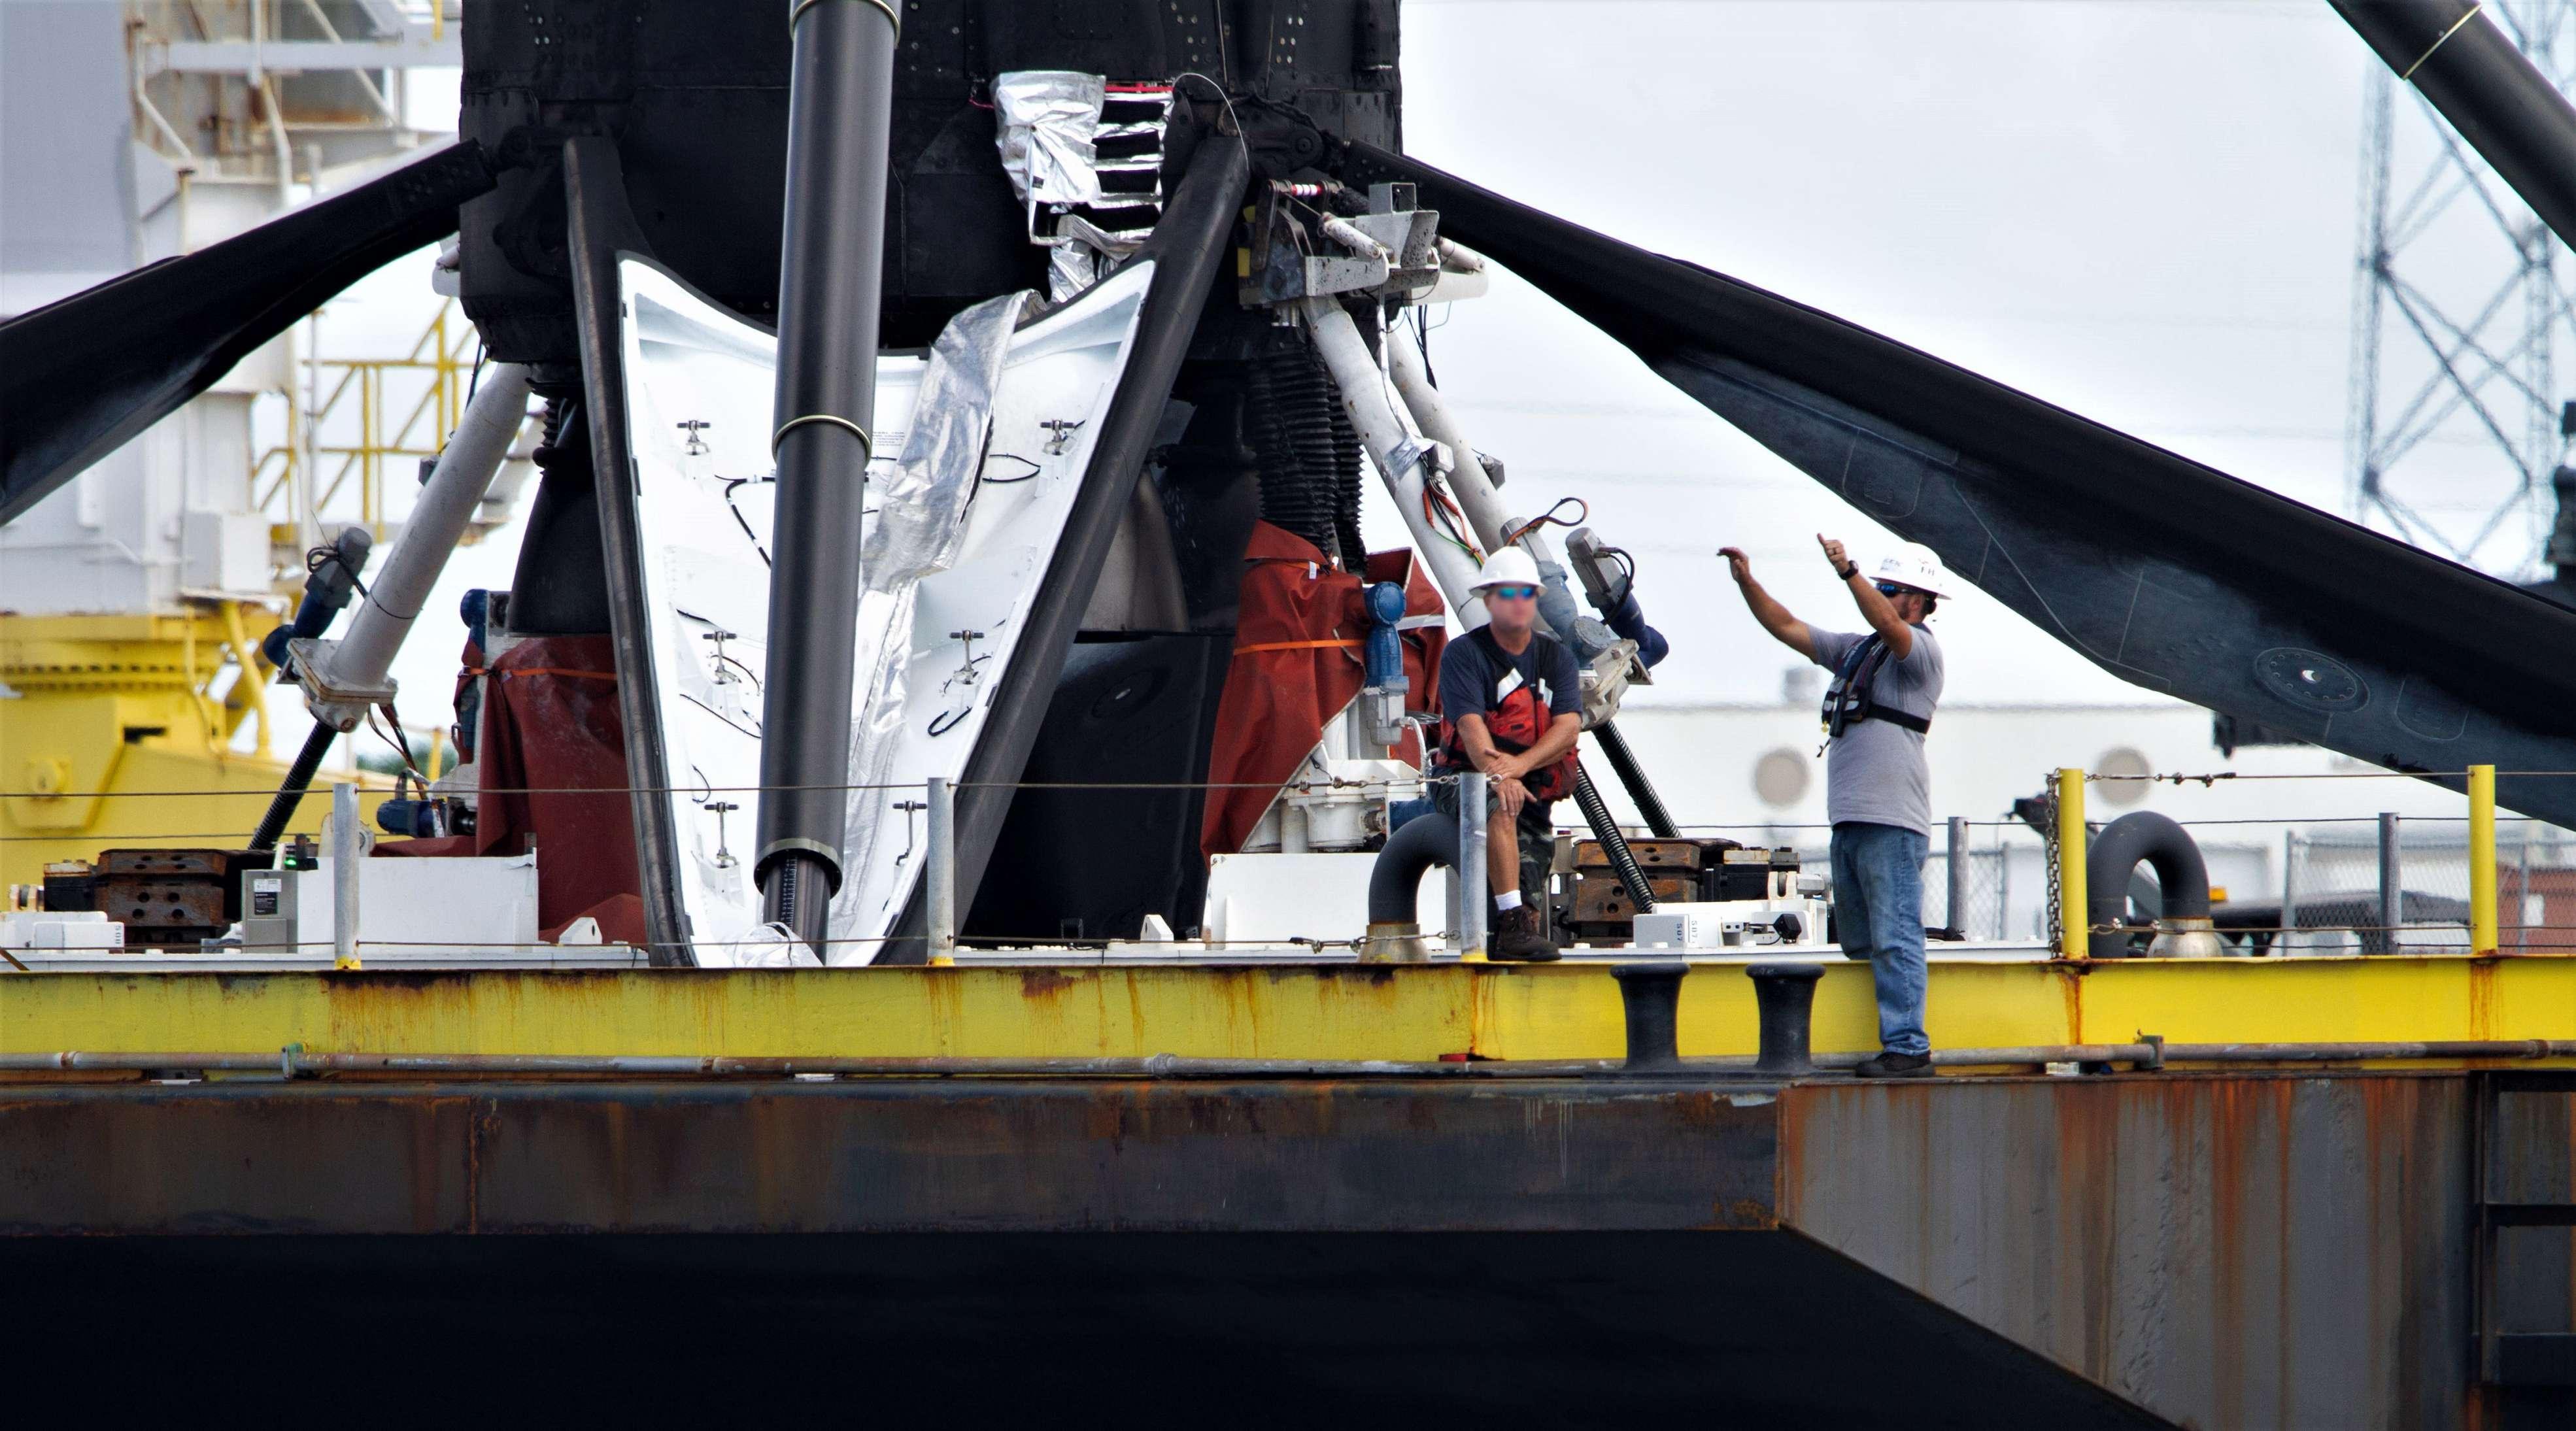 Falcon 9 B1049 OCISLY return detail 091218 (Tom Cross) 2(c)